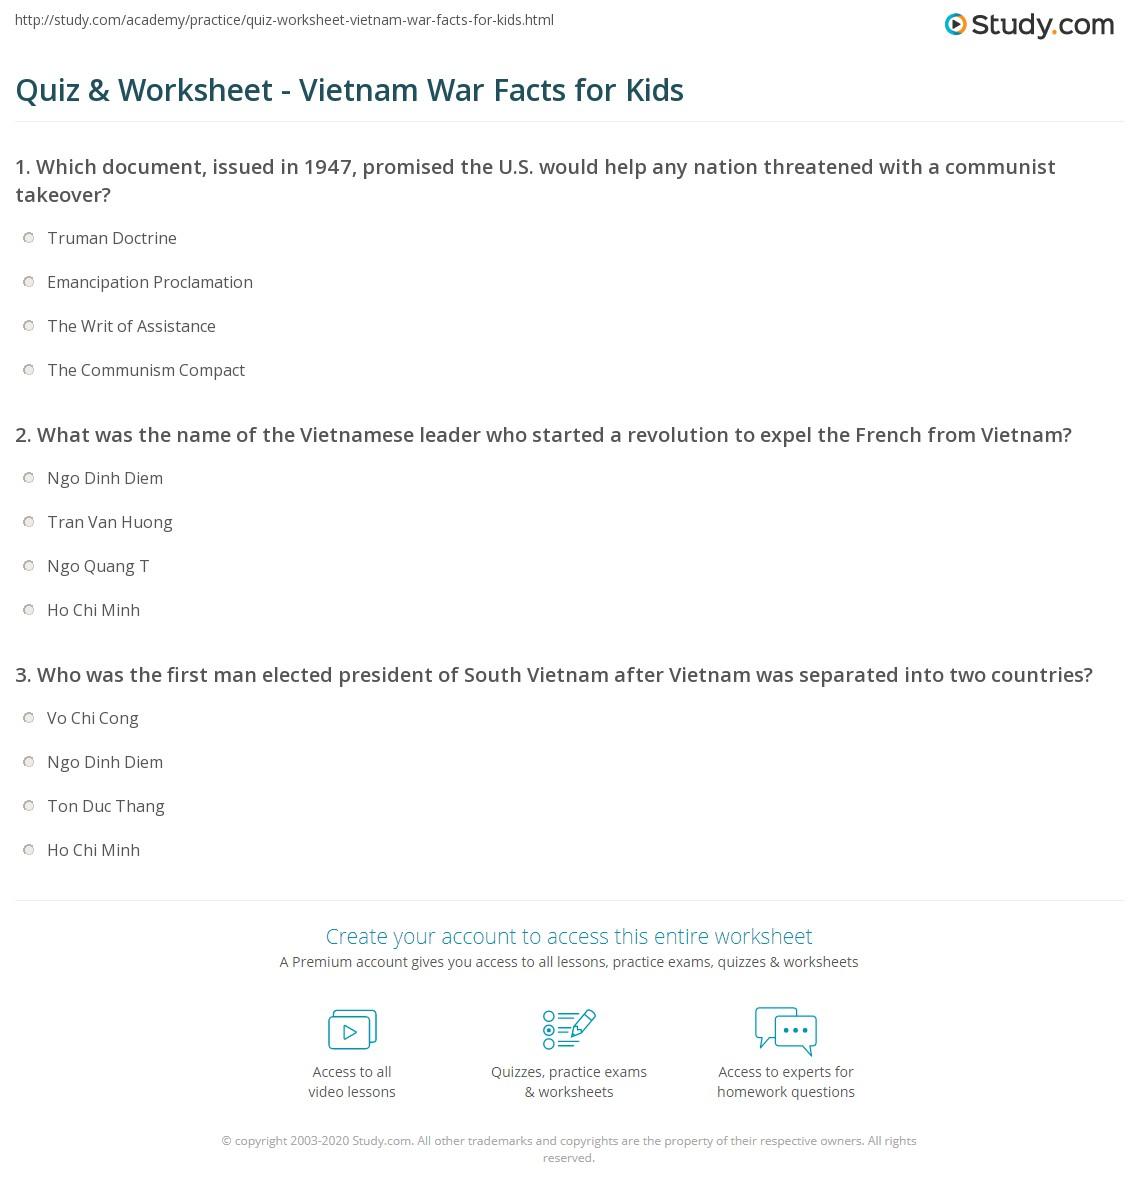 Quiz & Worksheet - Vietnam War Facts for Kids | Study.com